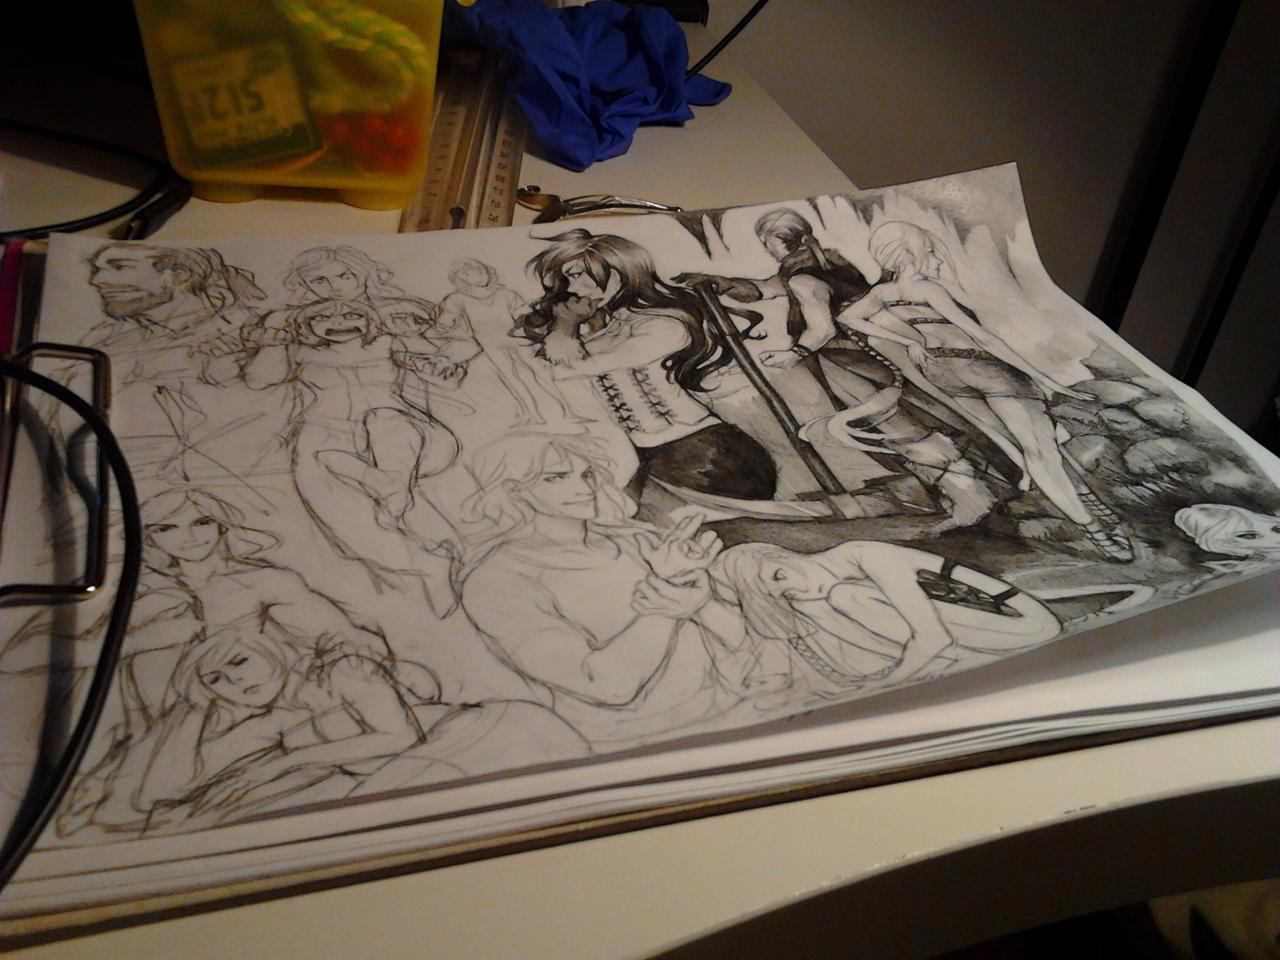 work in progress by Razuri-the-Sleepless